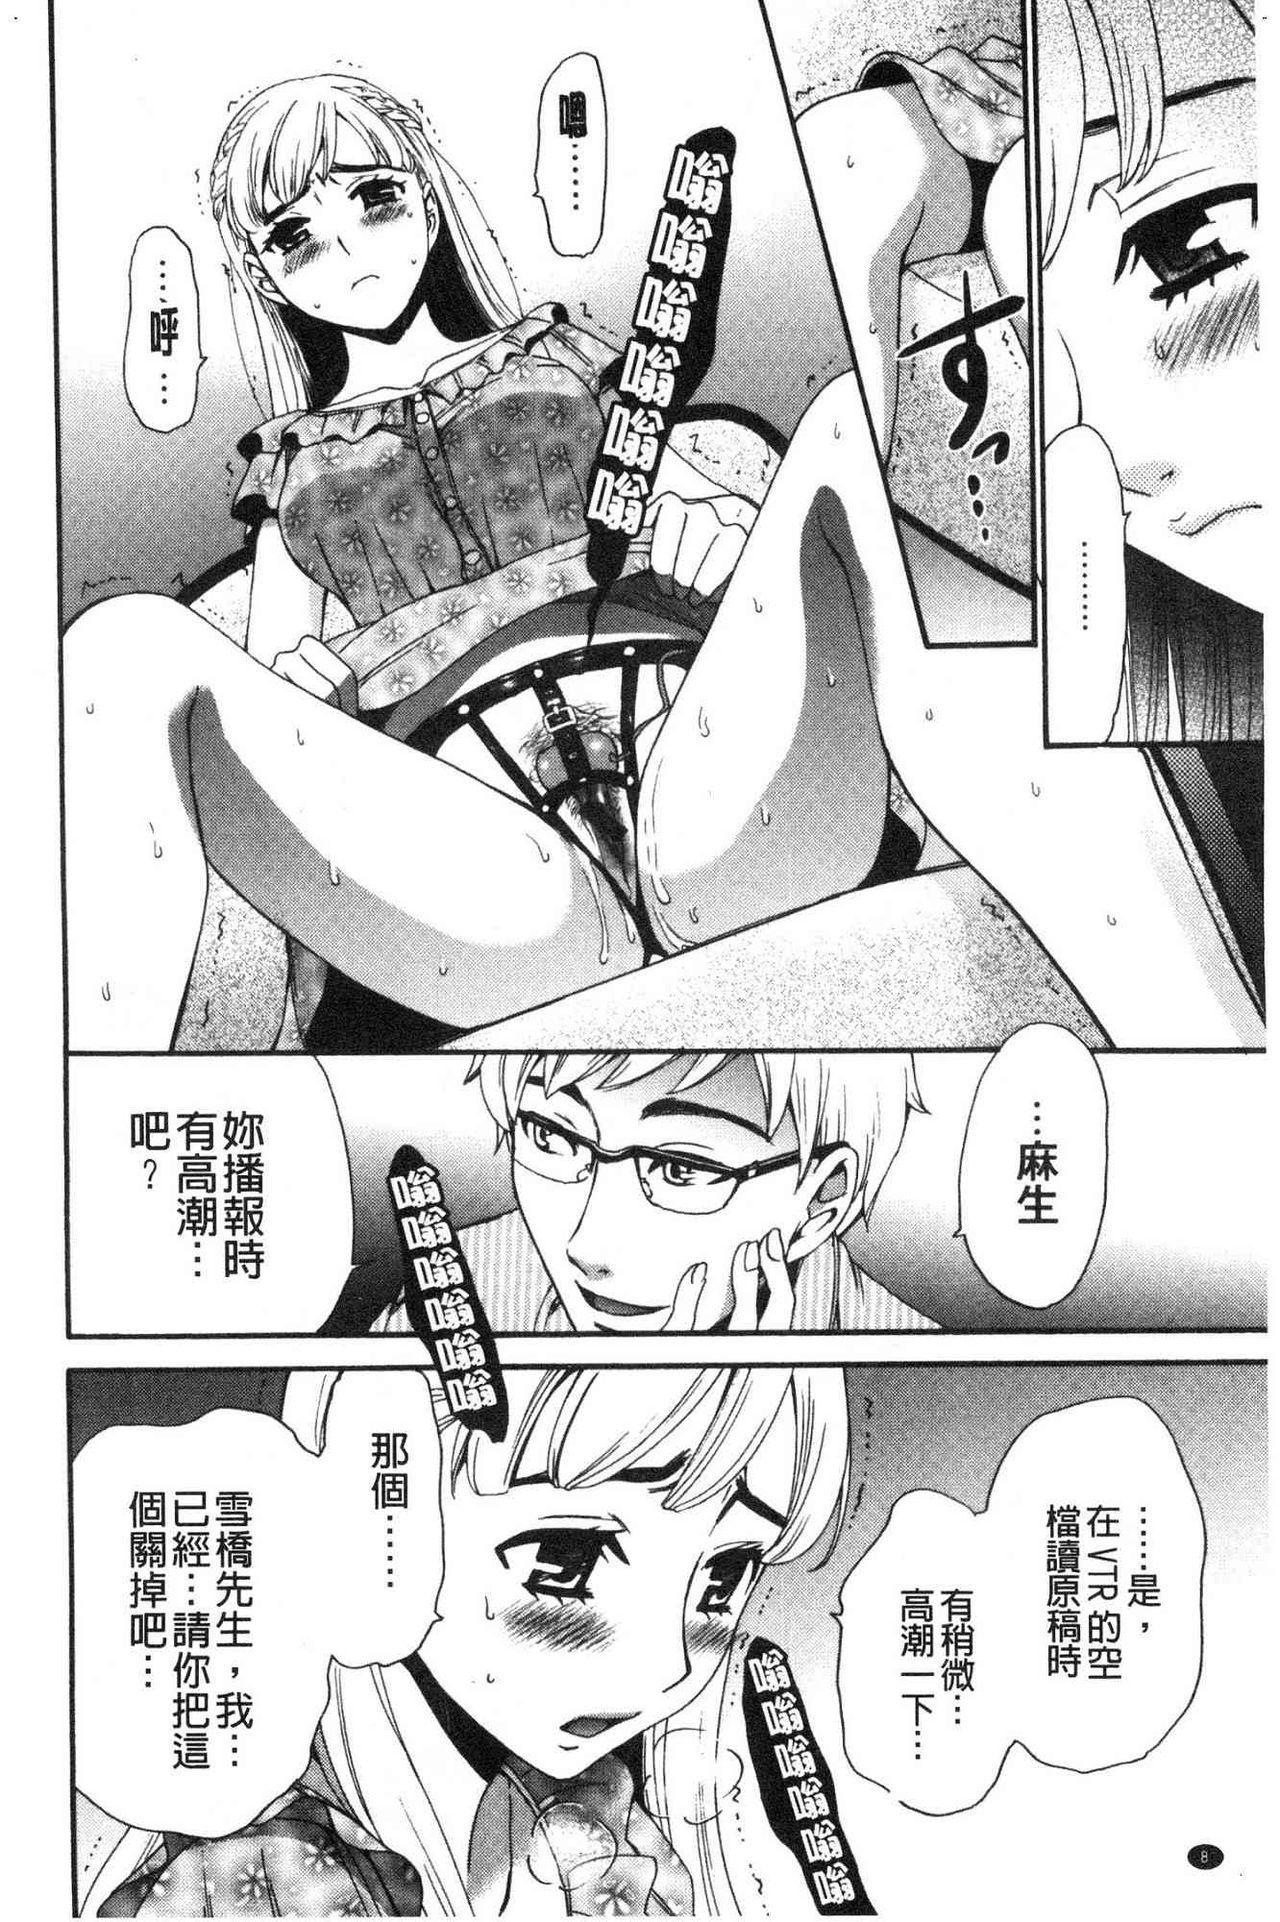 [Gotoh Akira]  21-ji no Onna ~Camera no Mae no Mesuinu~ 2 | 21時之女 ~鏡頭前的牝犬~ 2 [Chinese] 9